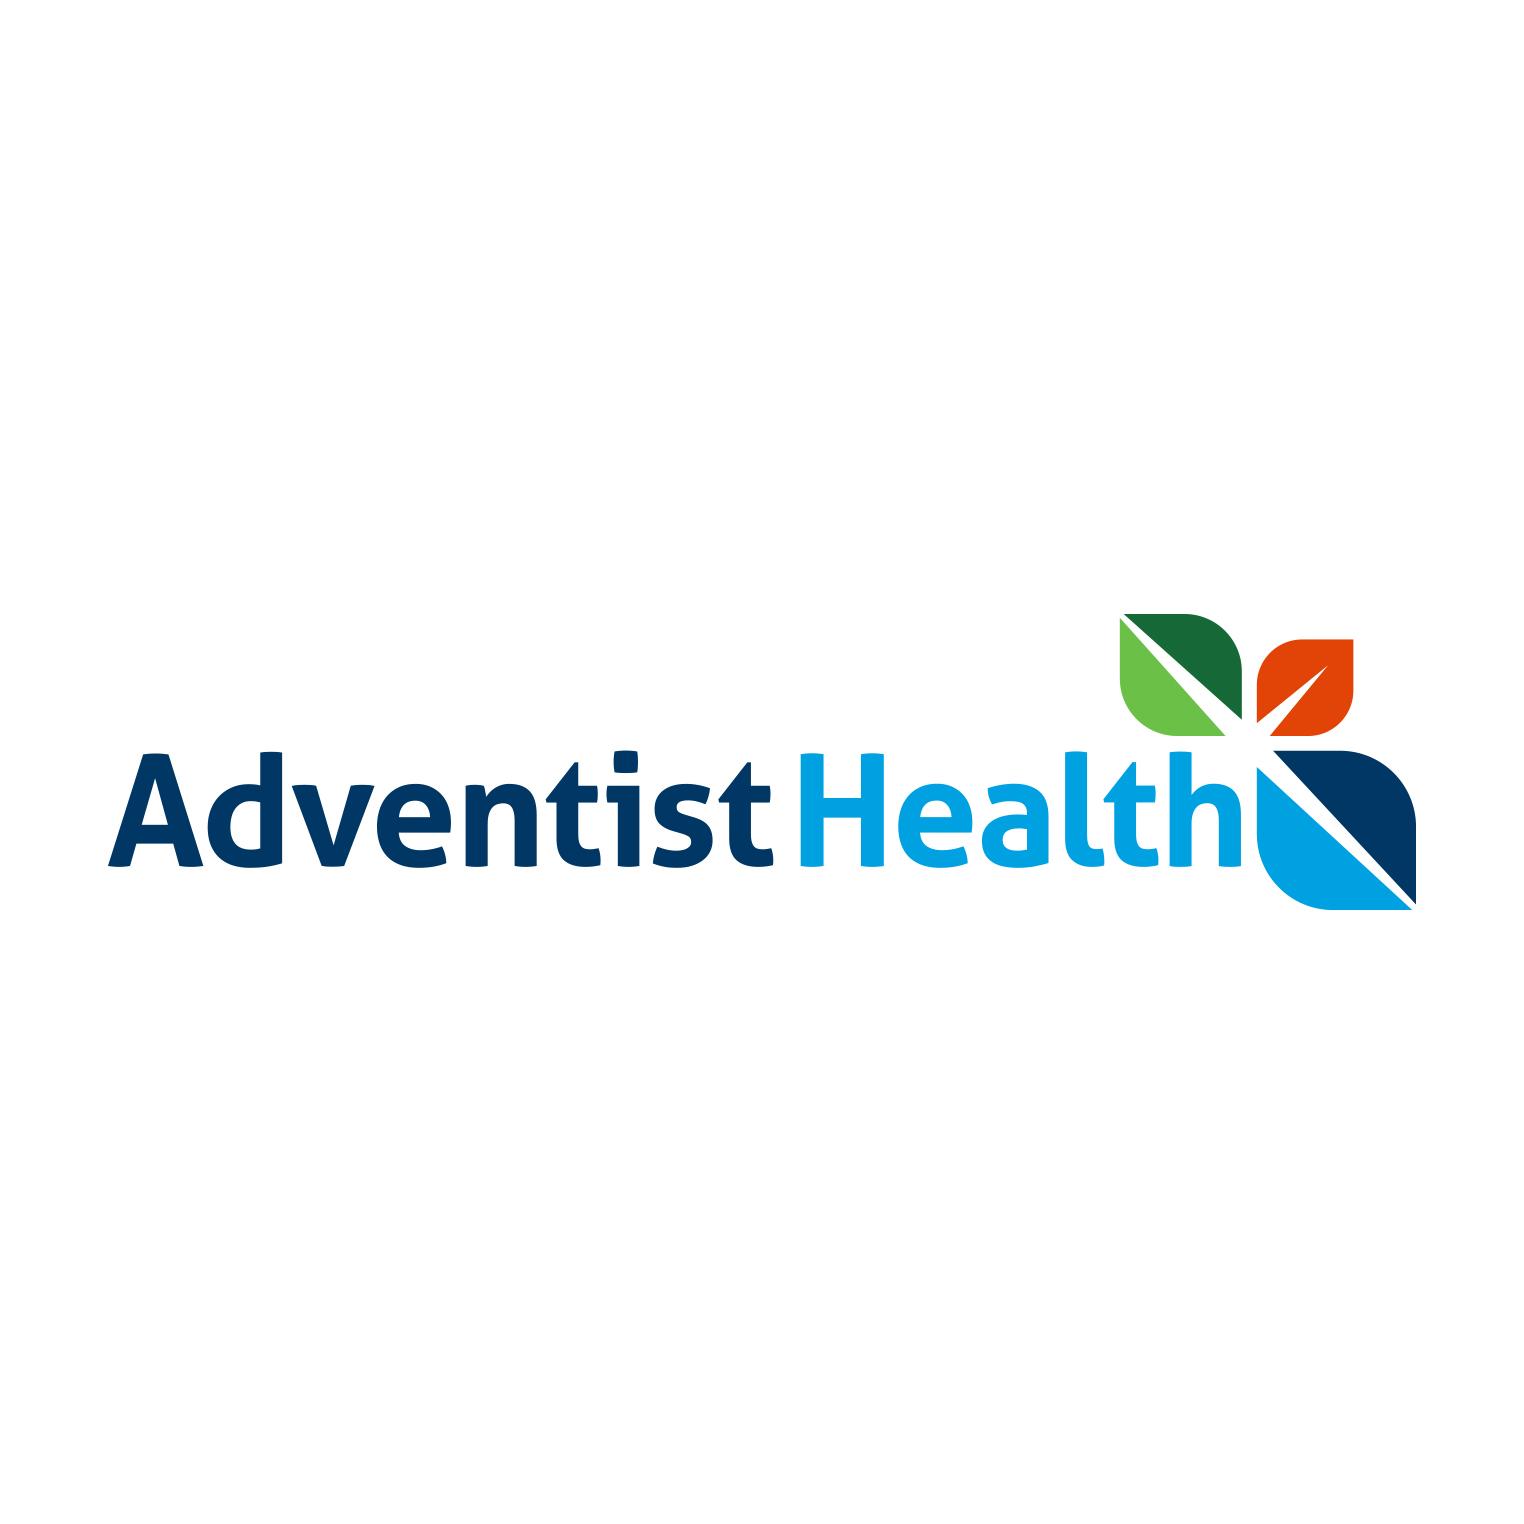 Adventist Health Medical Office - Wasco